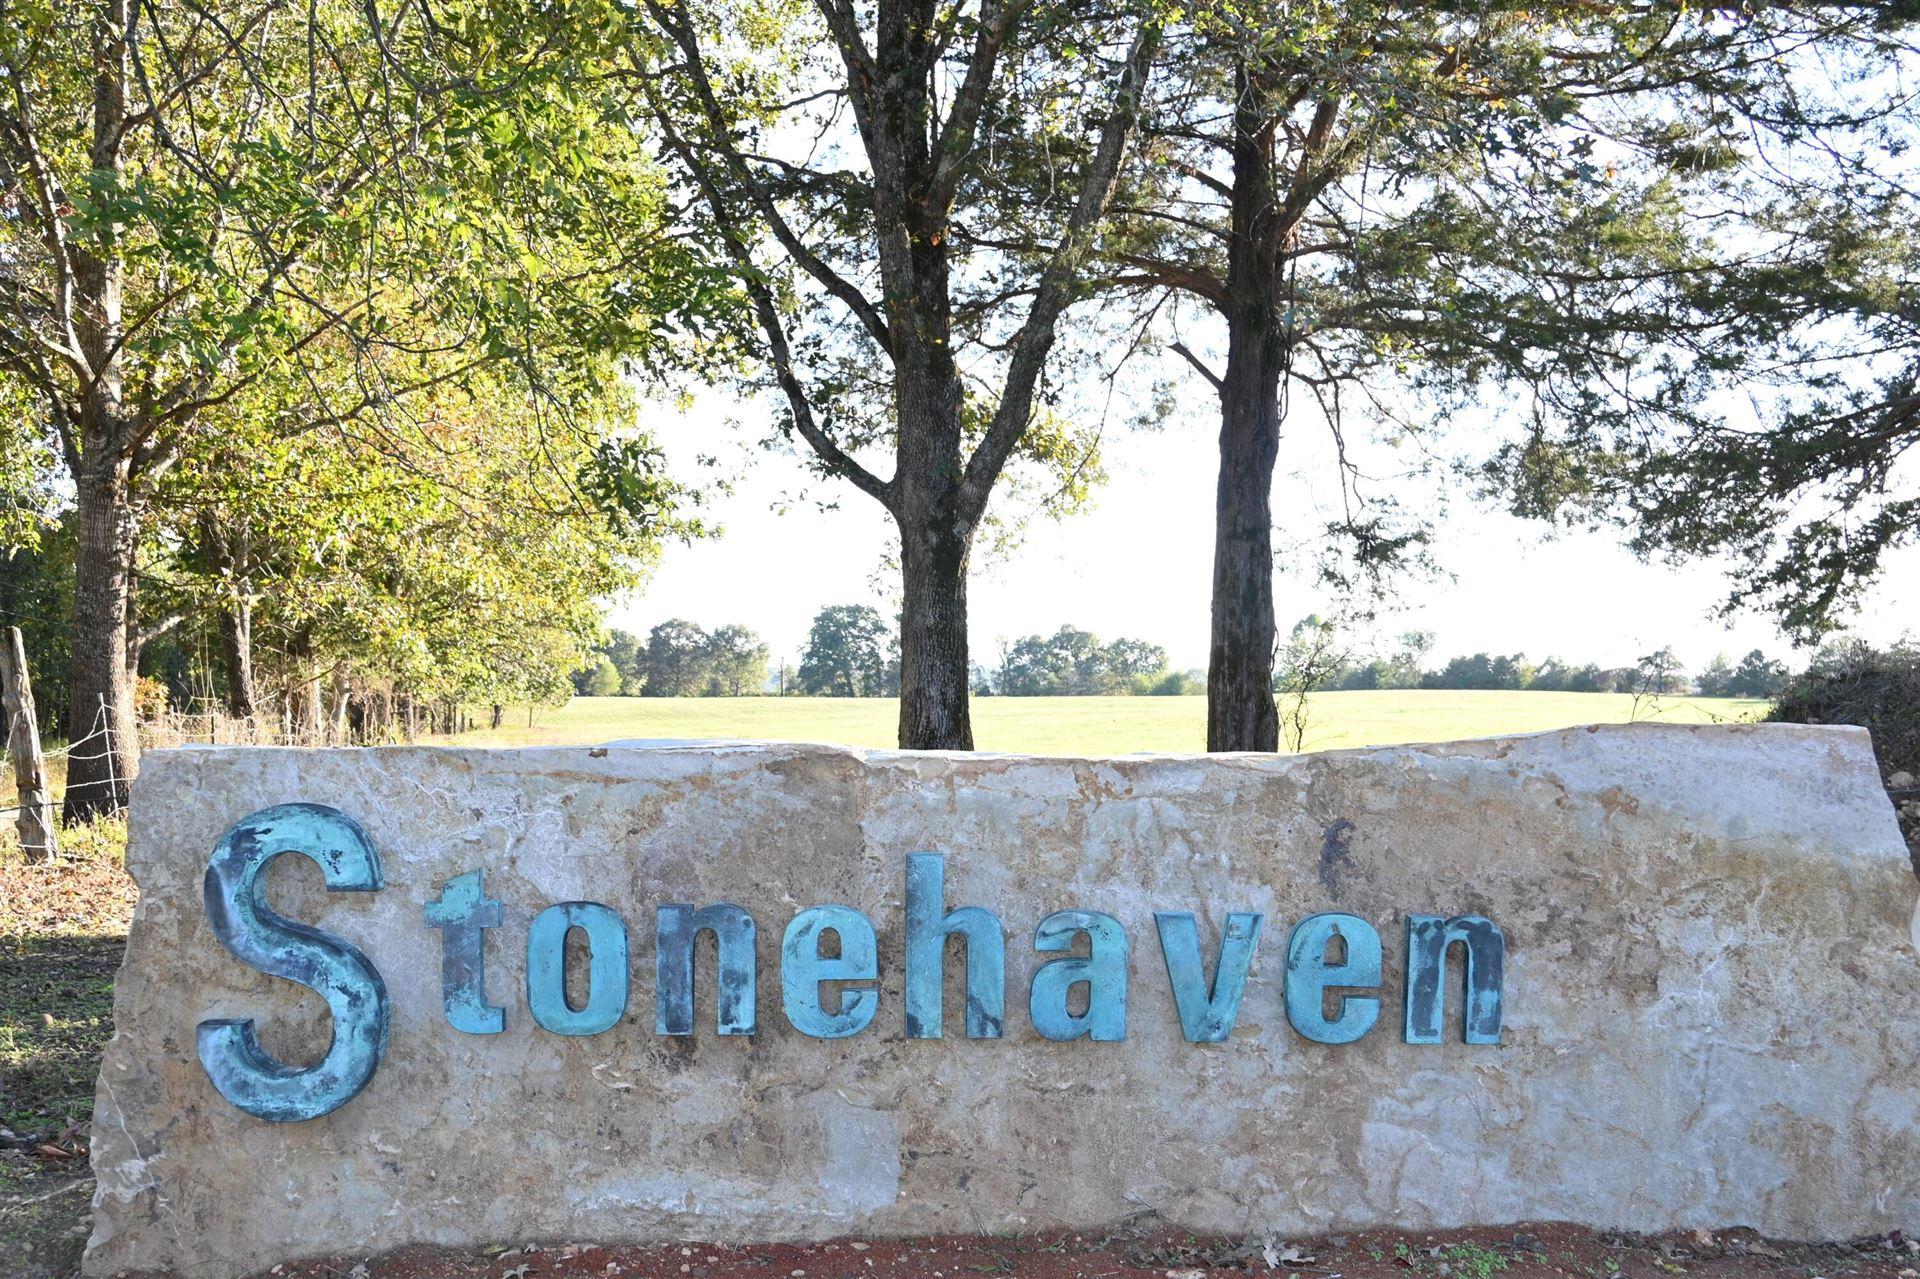 Photo of Lot 15 Stonehaven Way, Shell Knob, MO 65747 (MLS # 60203687)